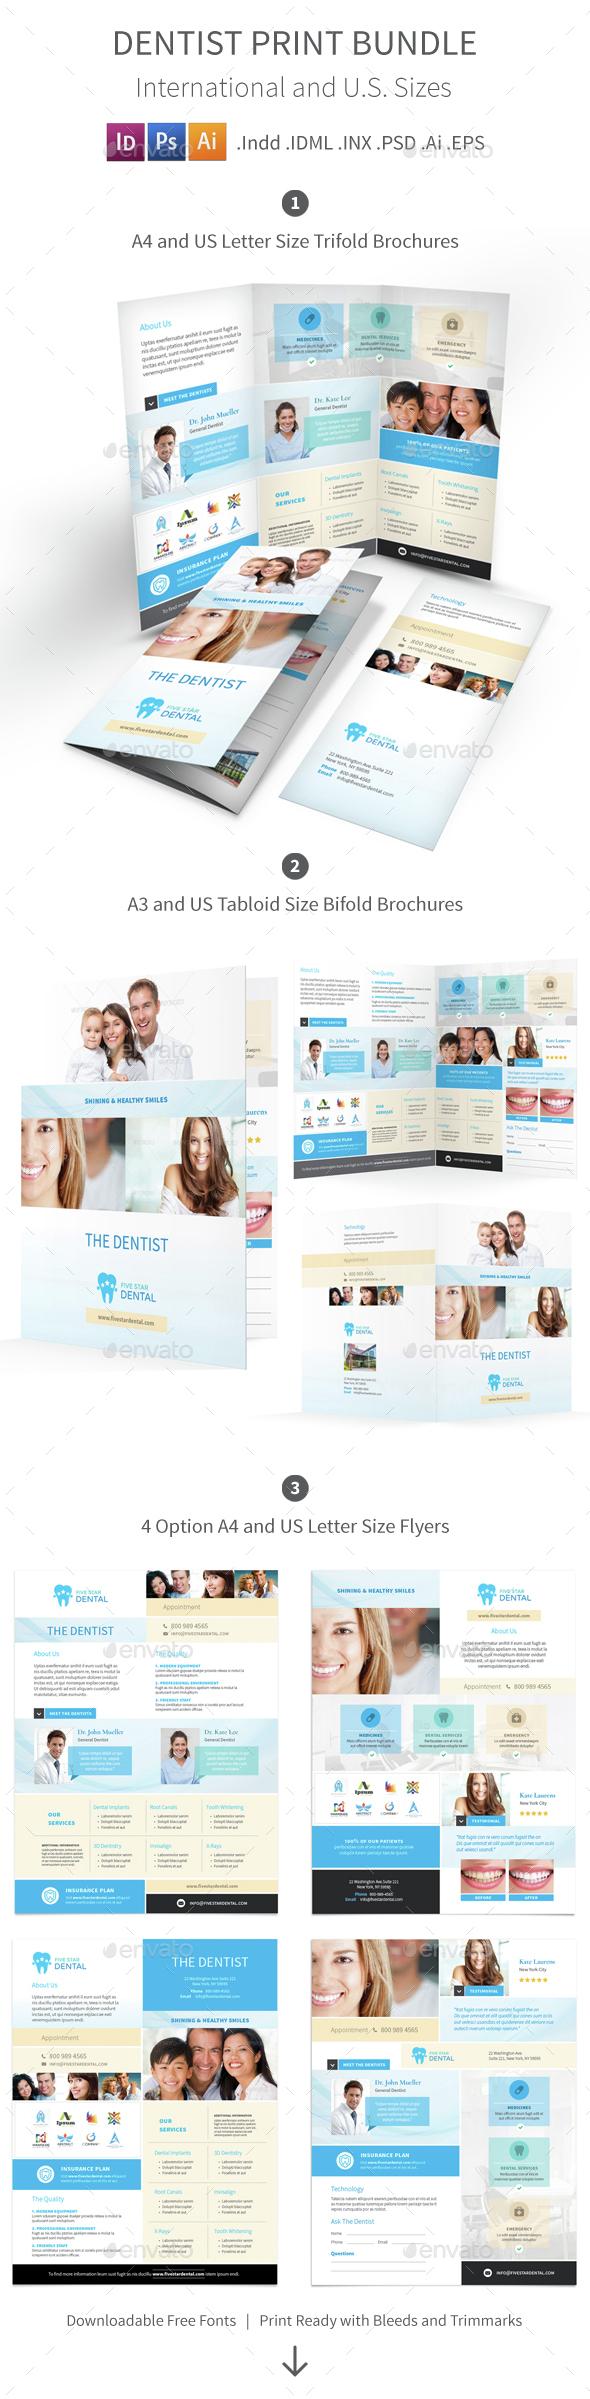 Dentist Print Bundle 3 - Informational Brochures